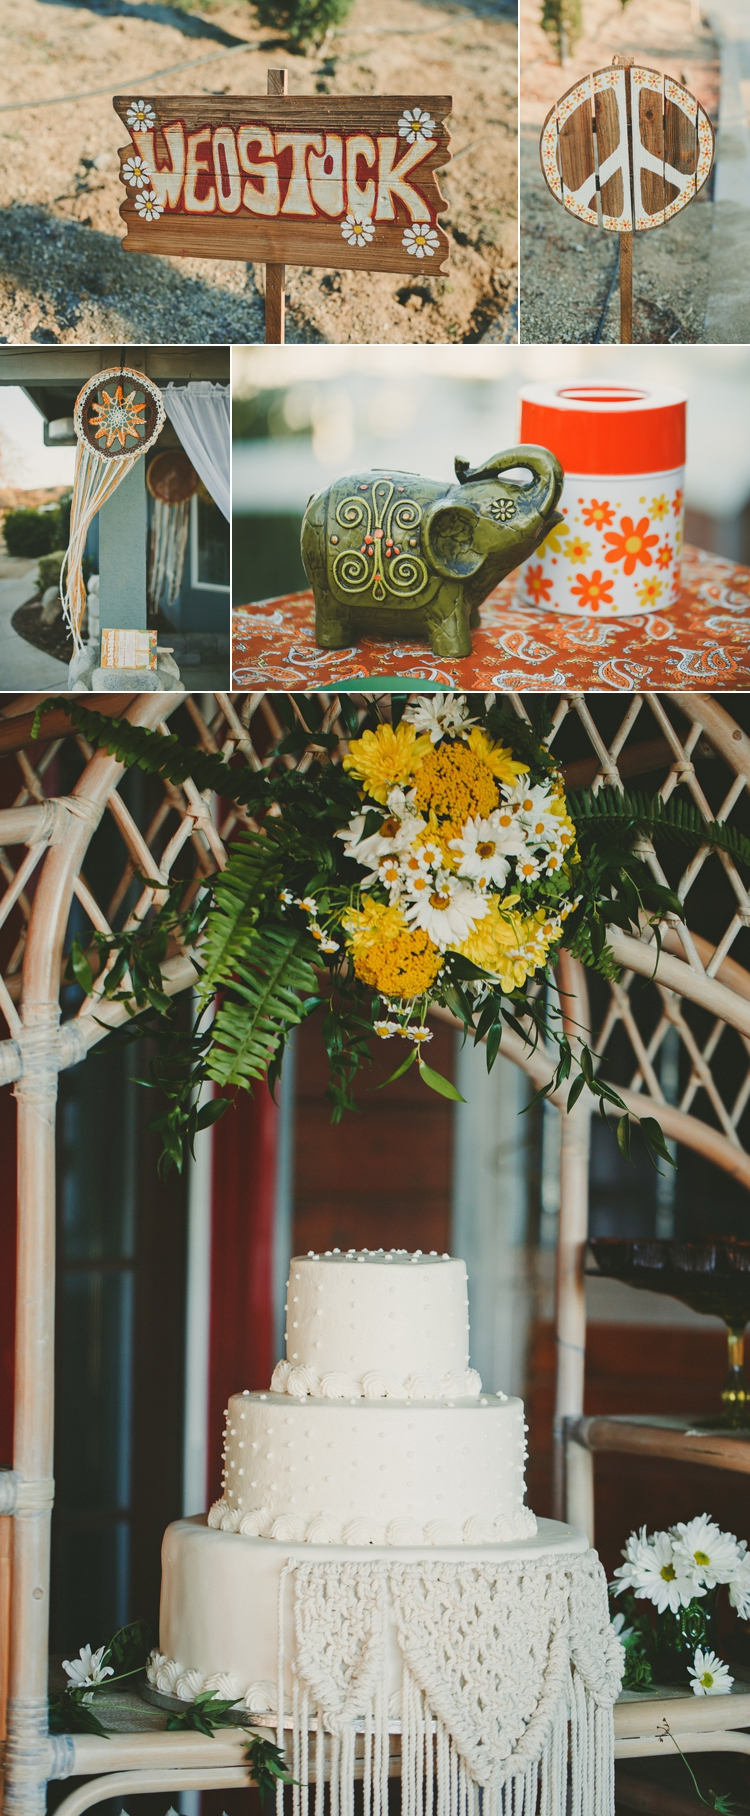 woodstock-inspired-wedding-photos-25